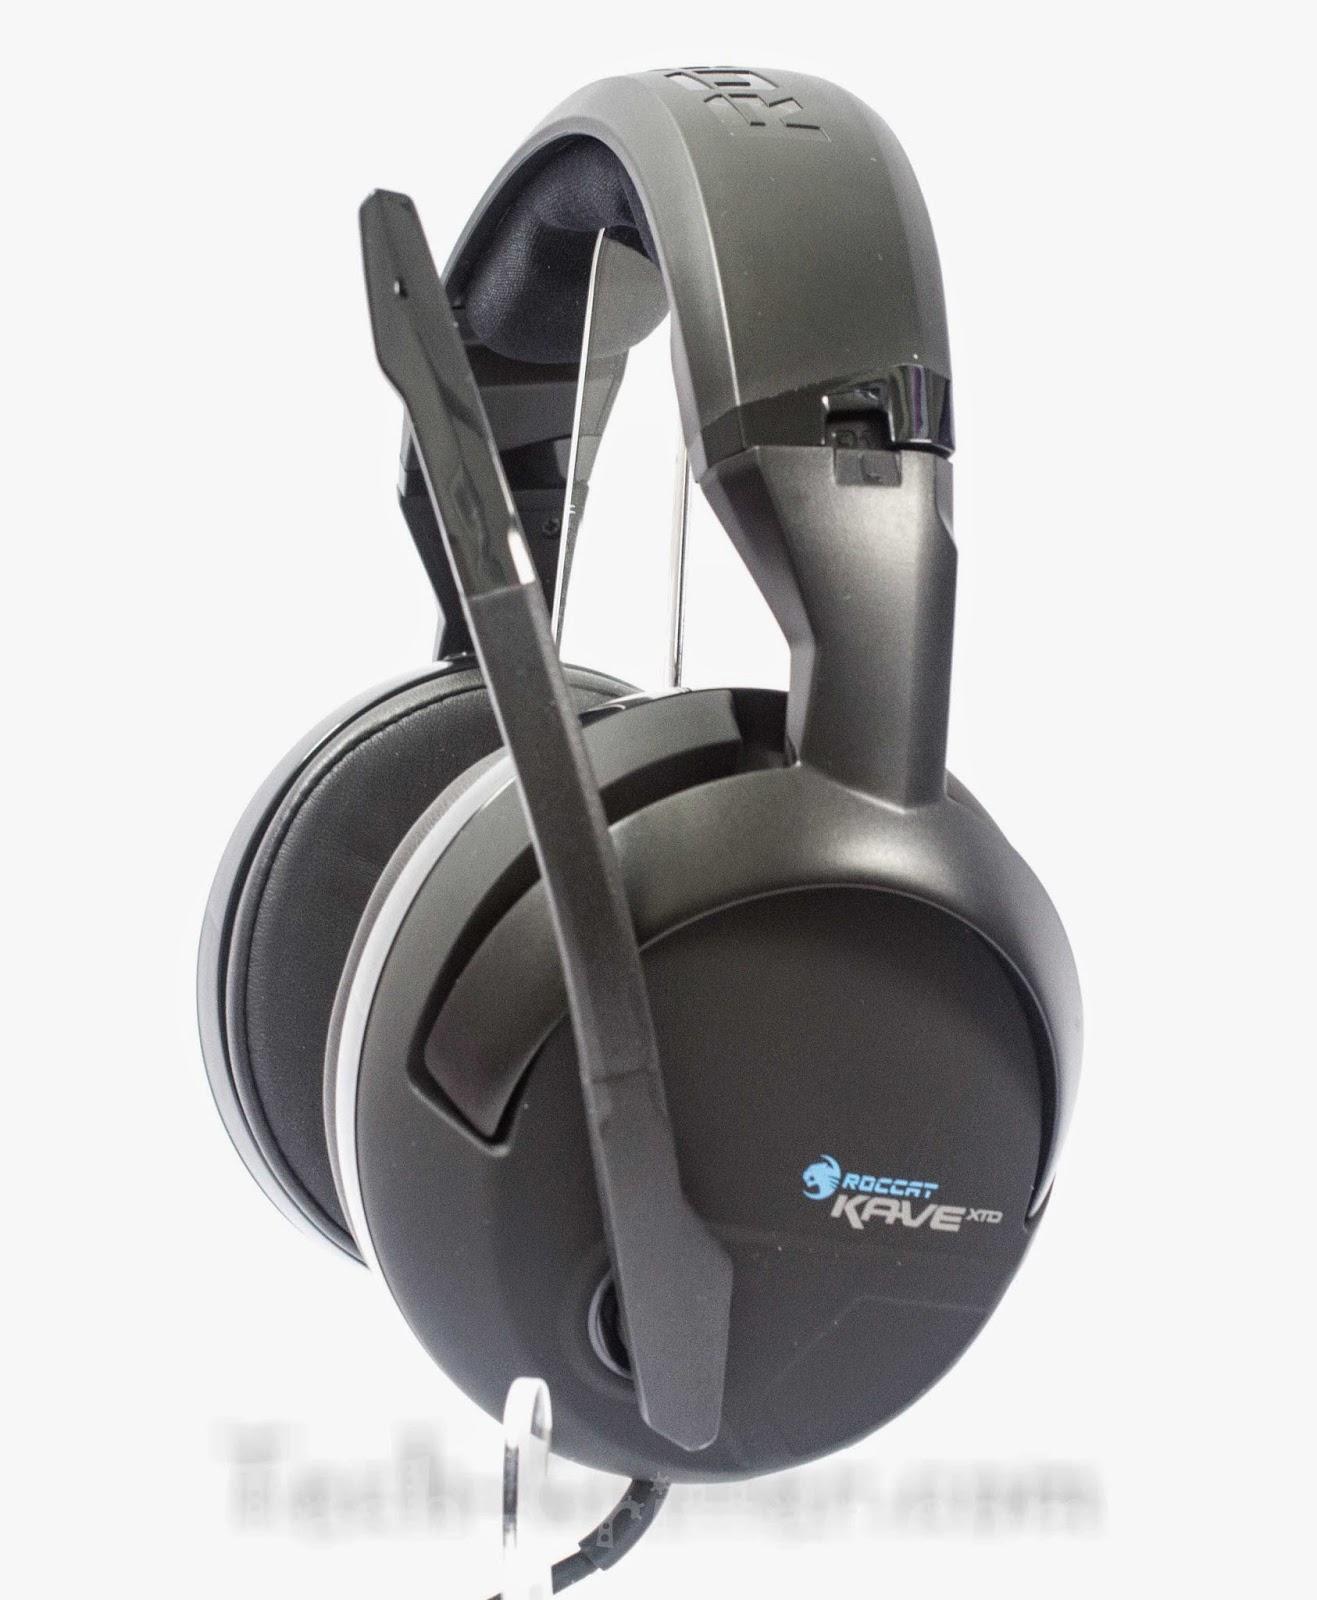 Unboxing & Review: Roccat Kave XTD 5.1 Digital Surround Sound Headset 66